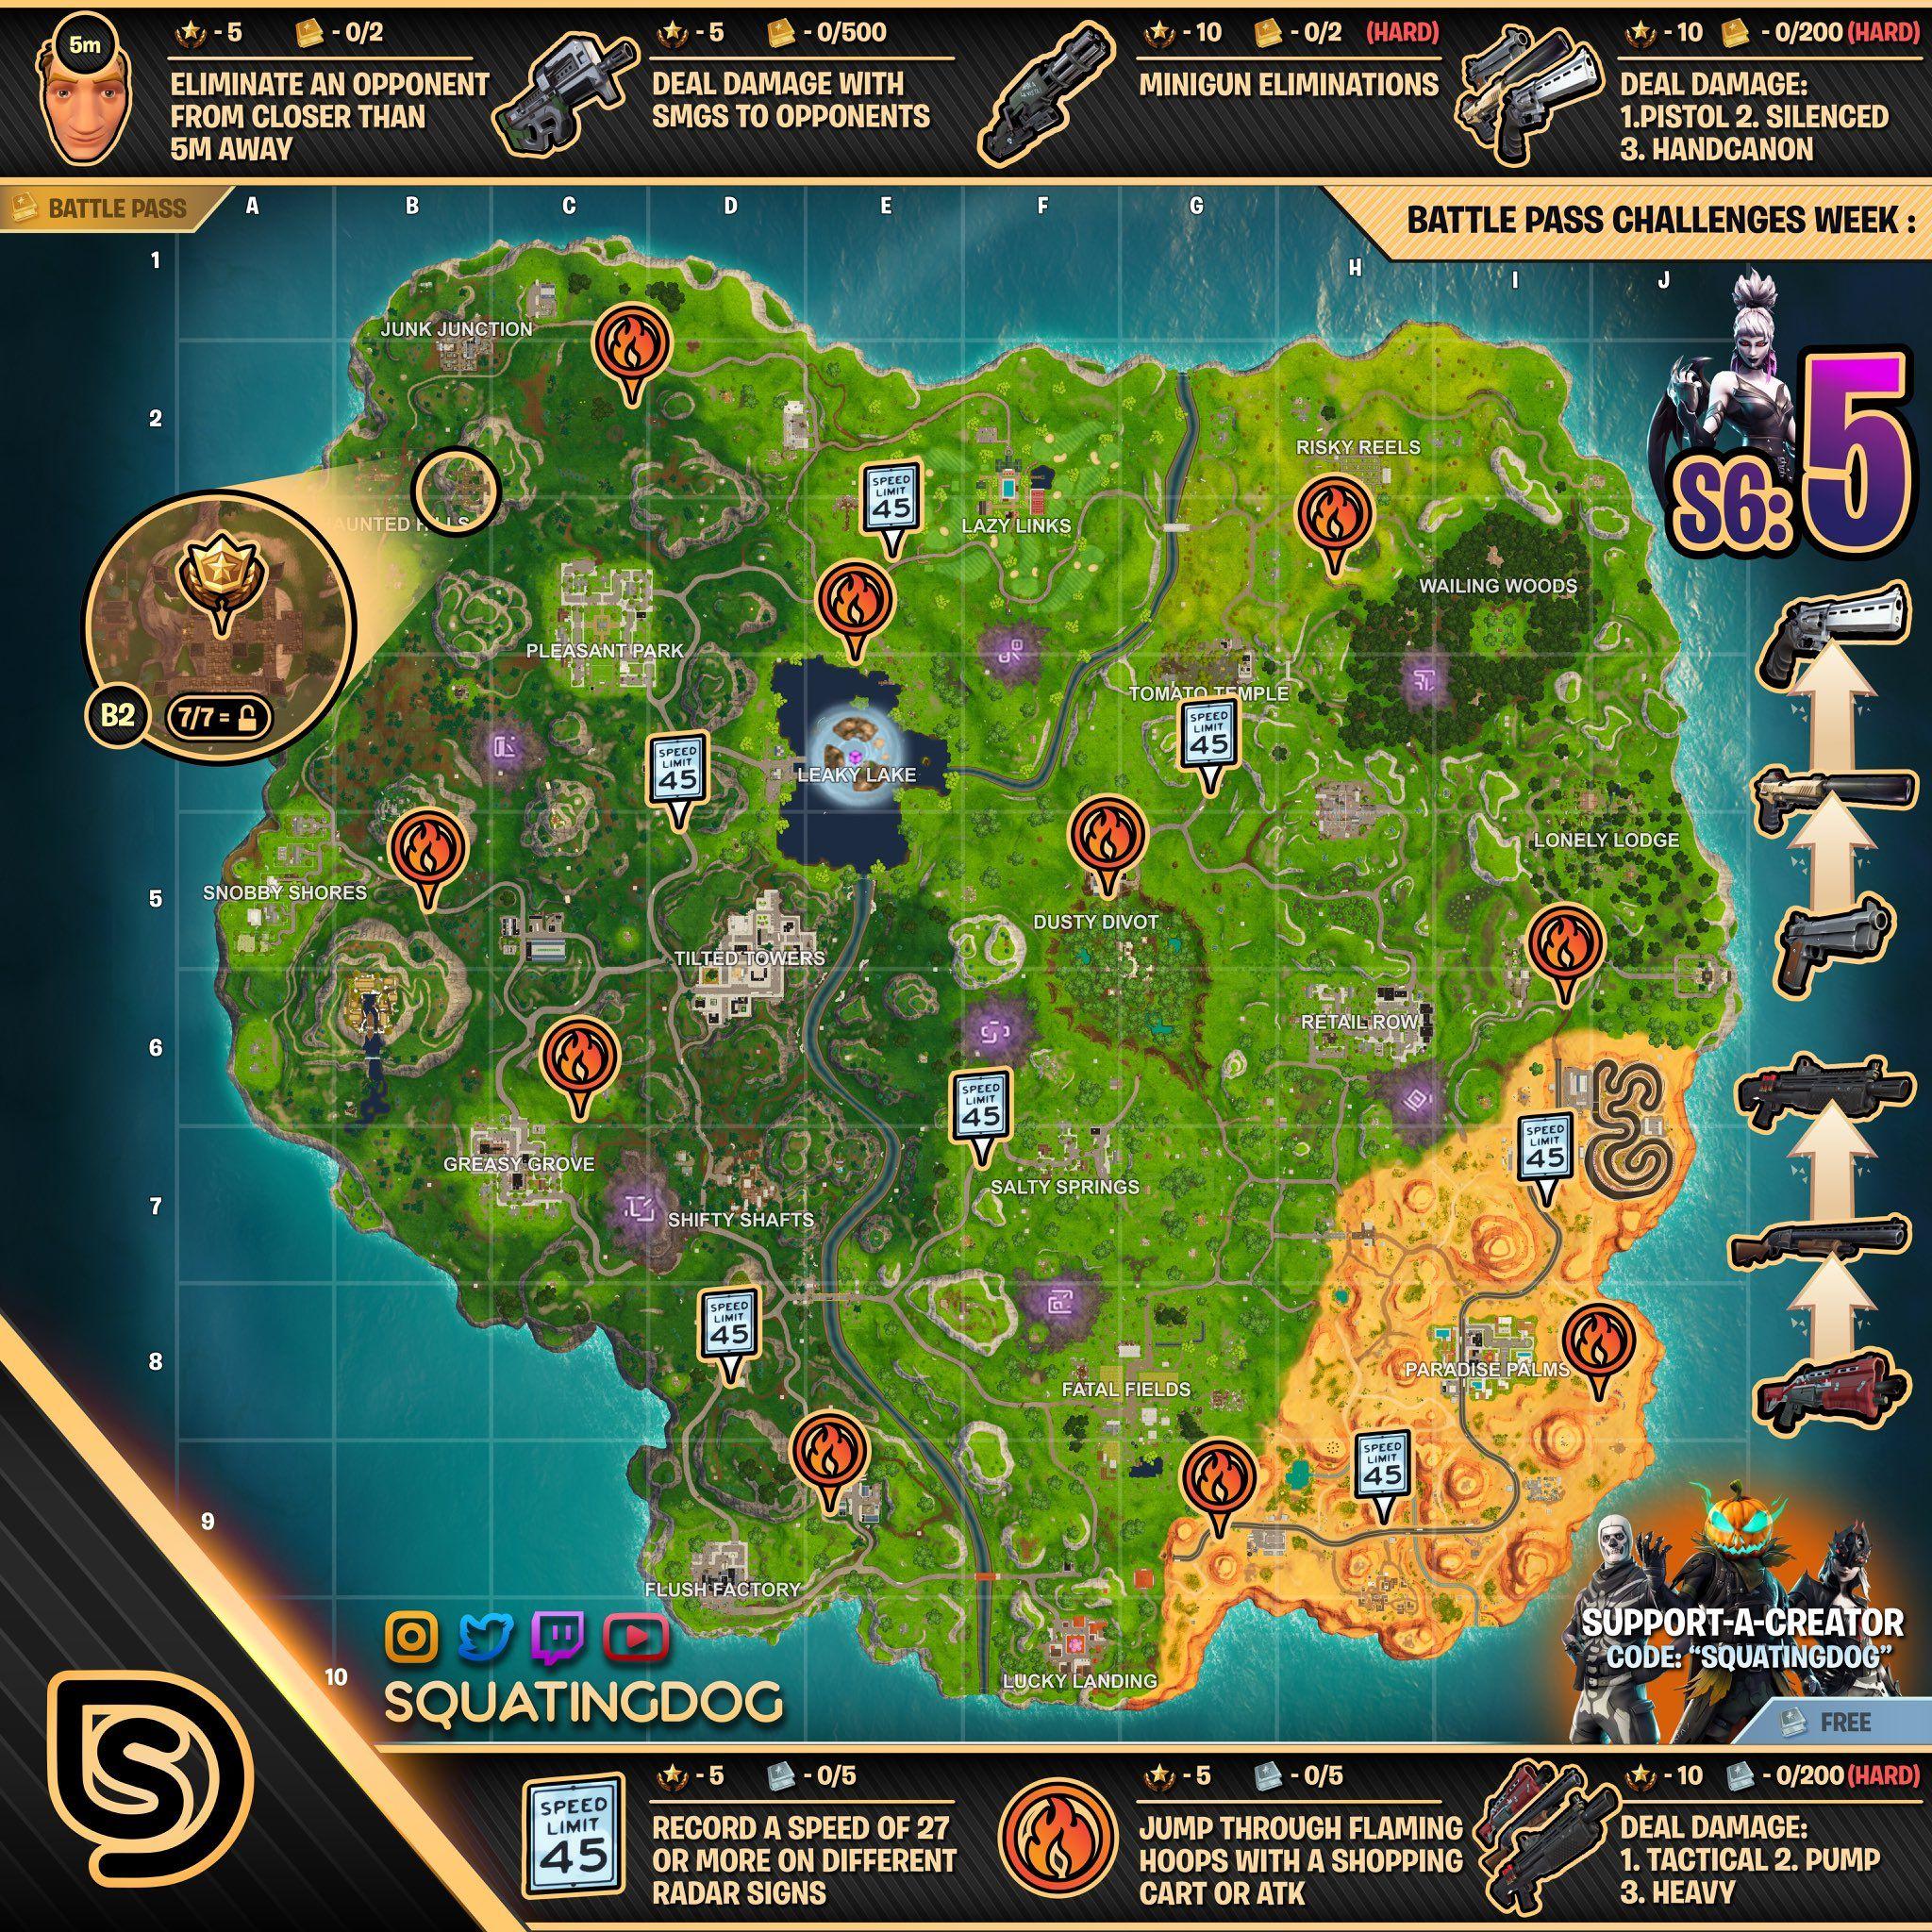 Full Cheat Sheet With All Season 6 Week 5 Fortnite Challenge